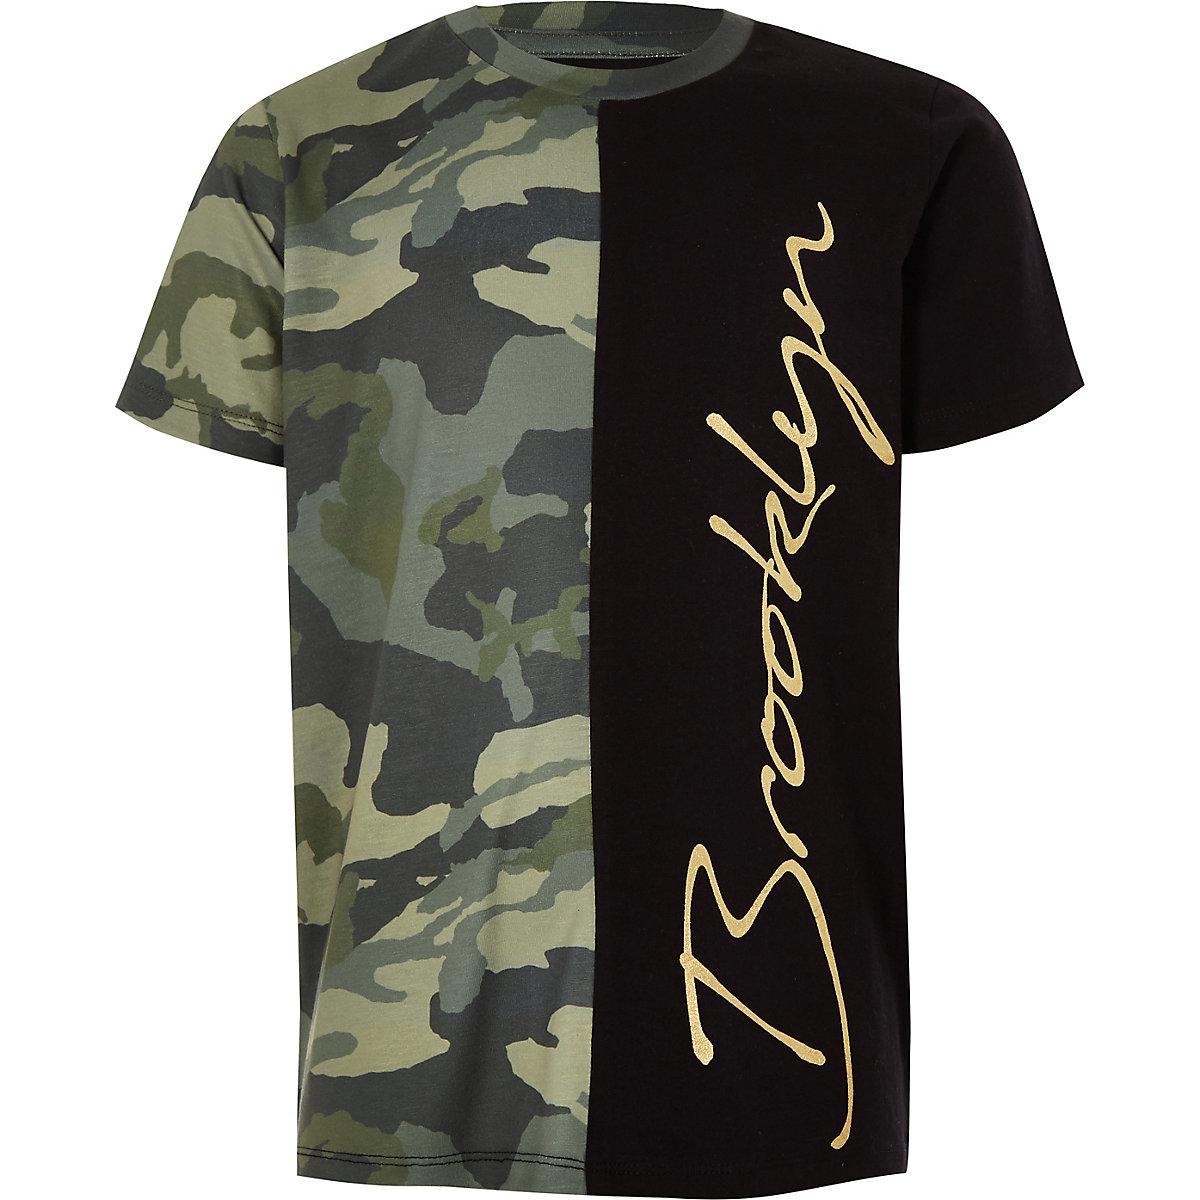 Boys khaki camo 'Brooklyn' T-shirt